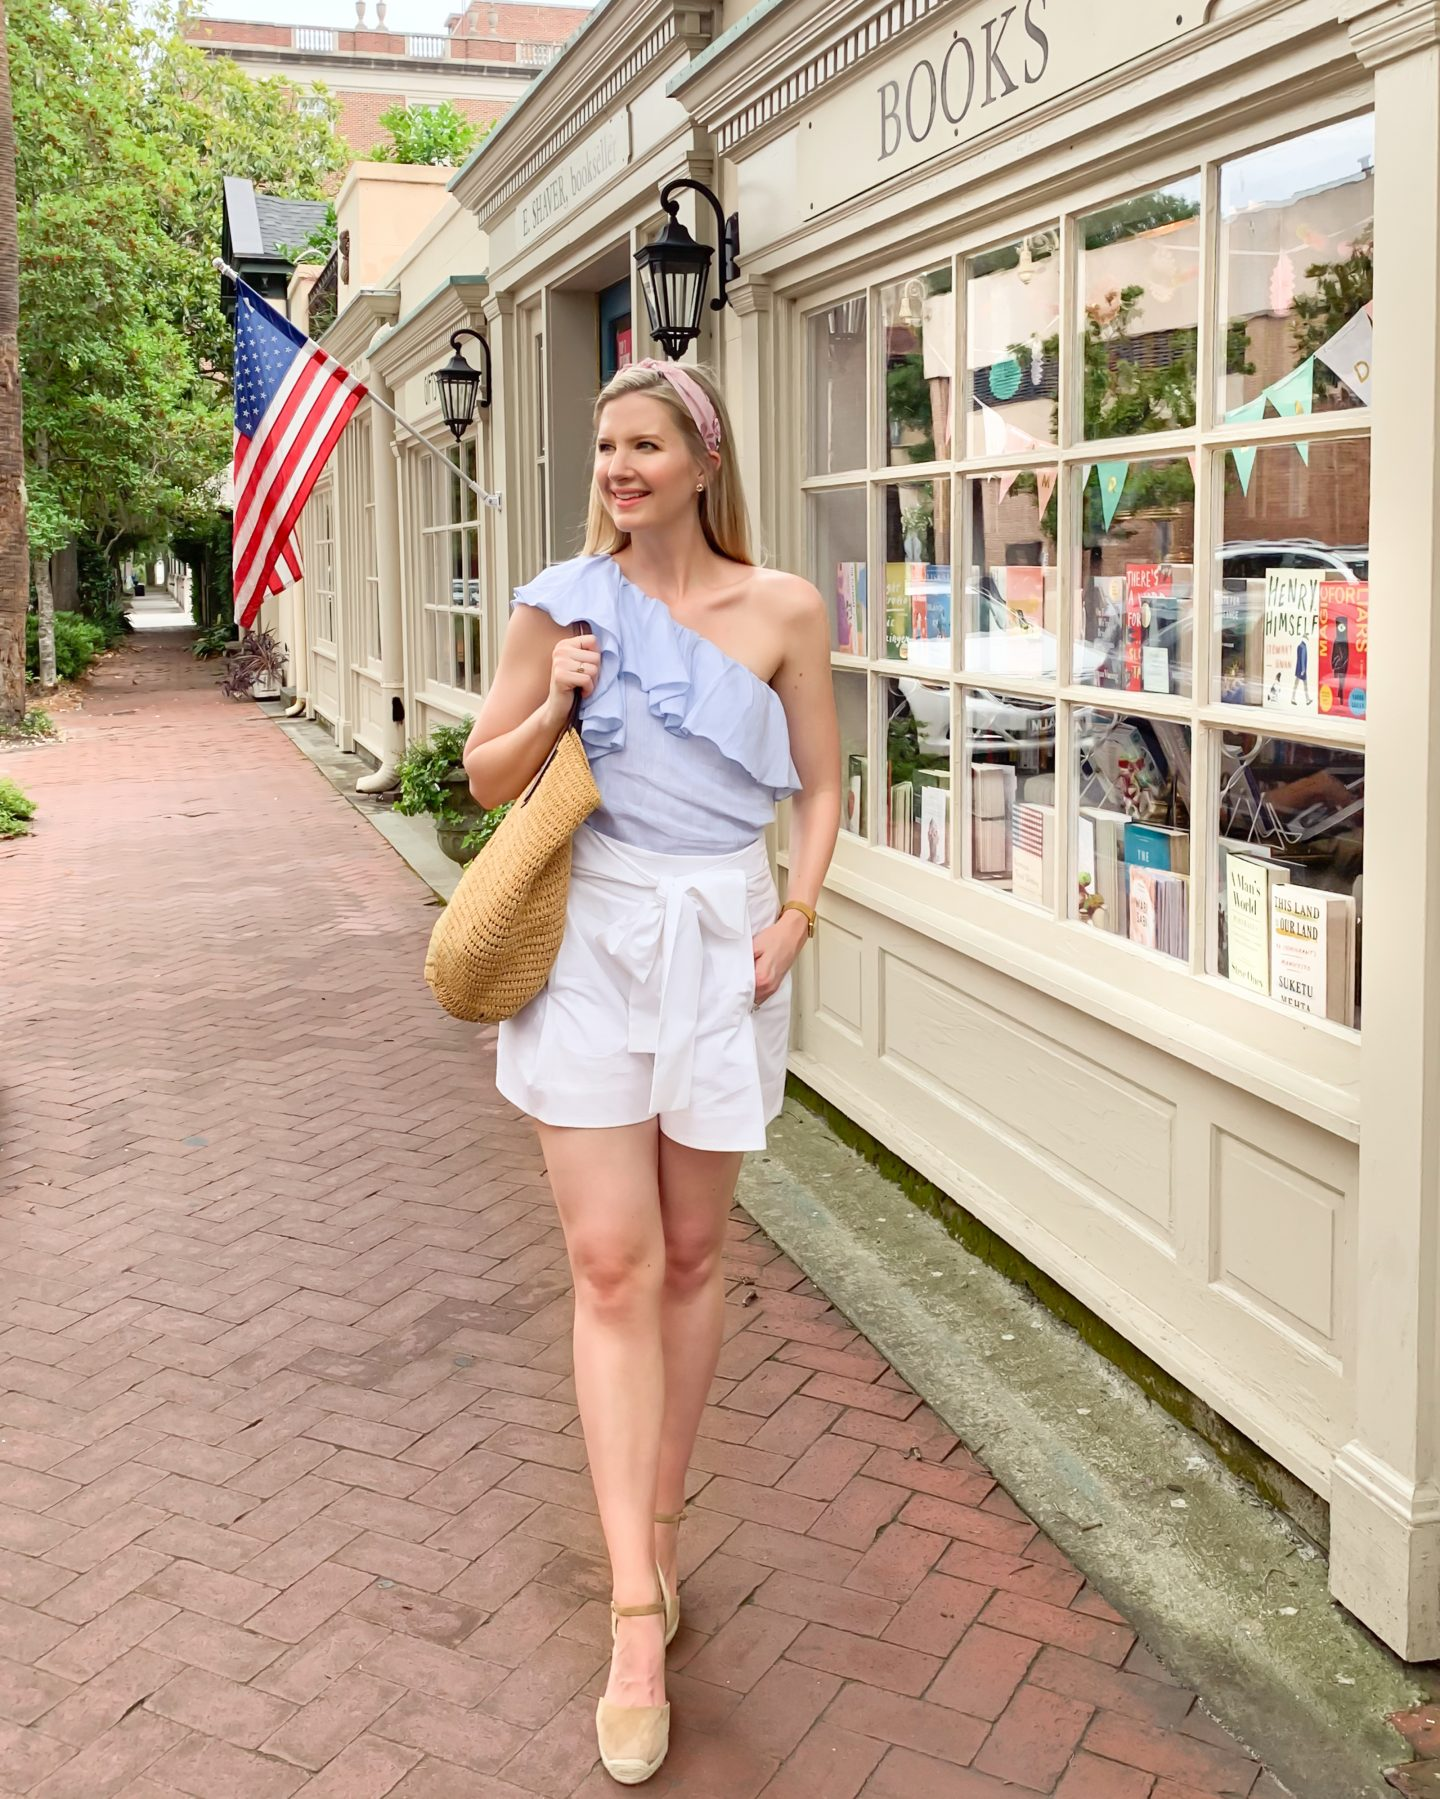 Ashley Brooke at E. Shaver Booksellers in Savannah, GA